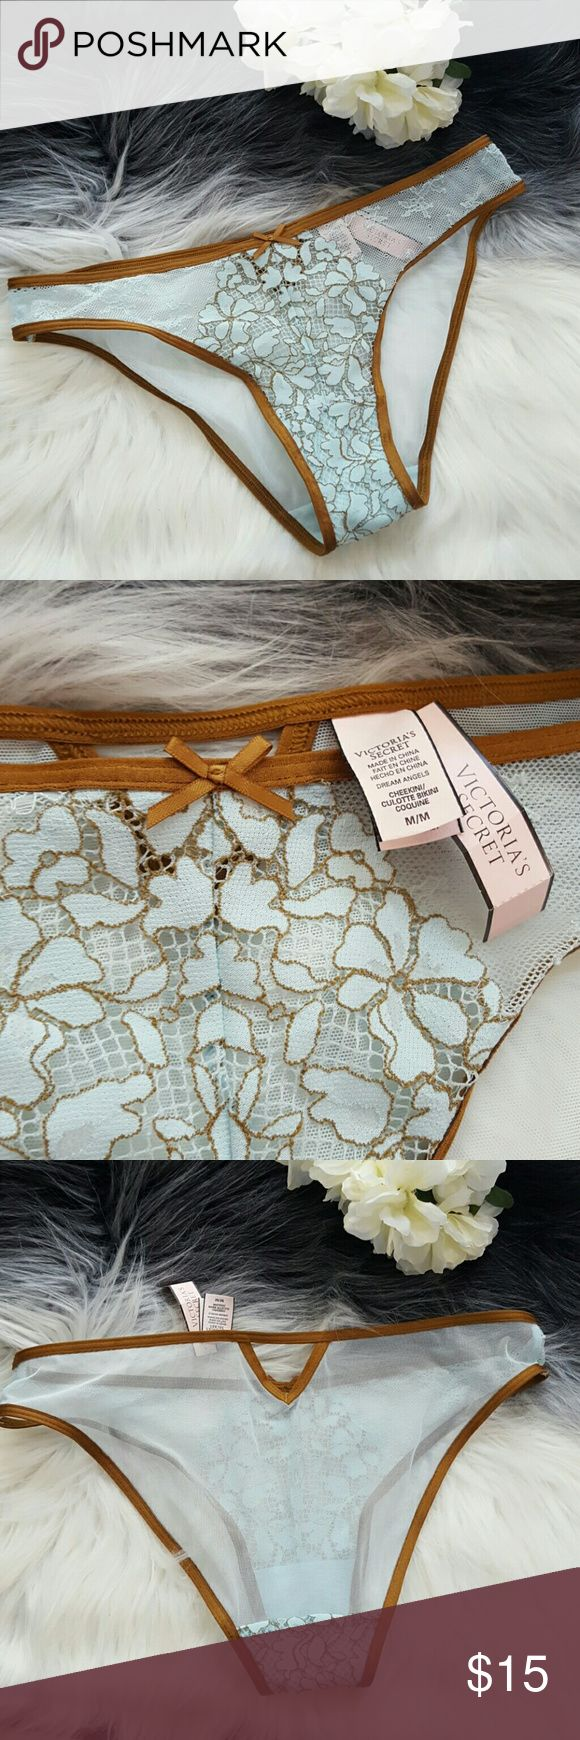 CHEEKINI VICTORIA'S SECRET PANTY Gorgeous transparent lace panties. Brand new!! Victoria's Secret Intimates & Sleepwear Panties